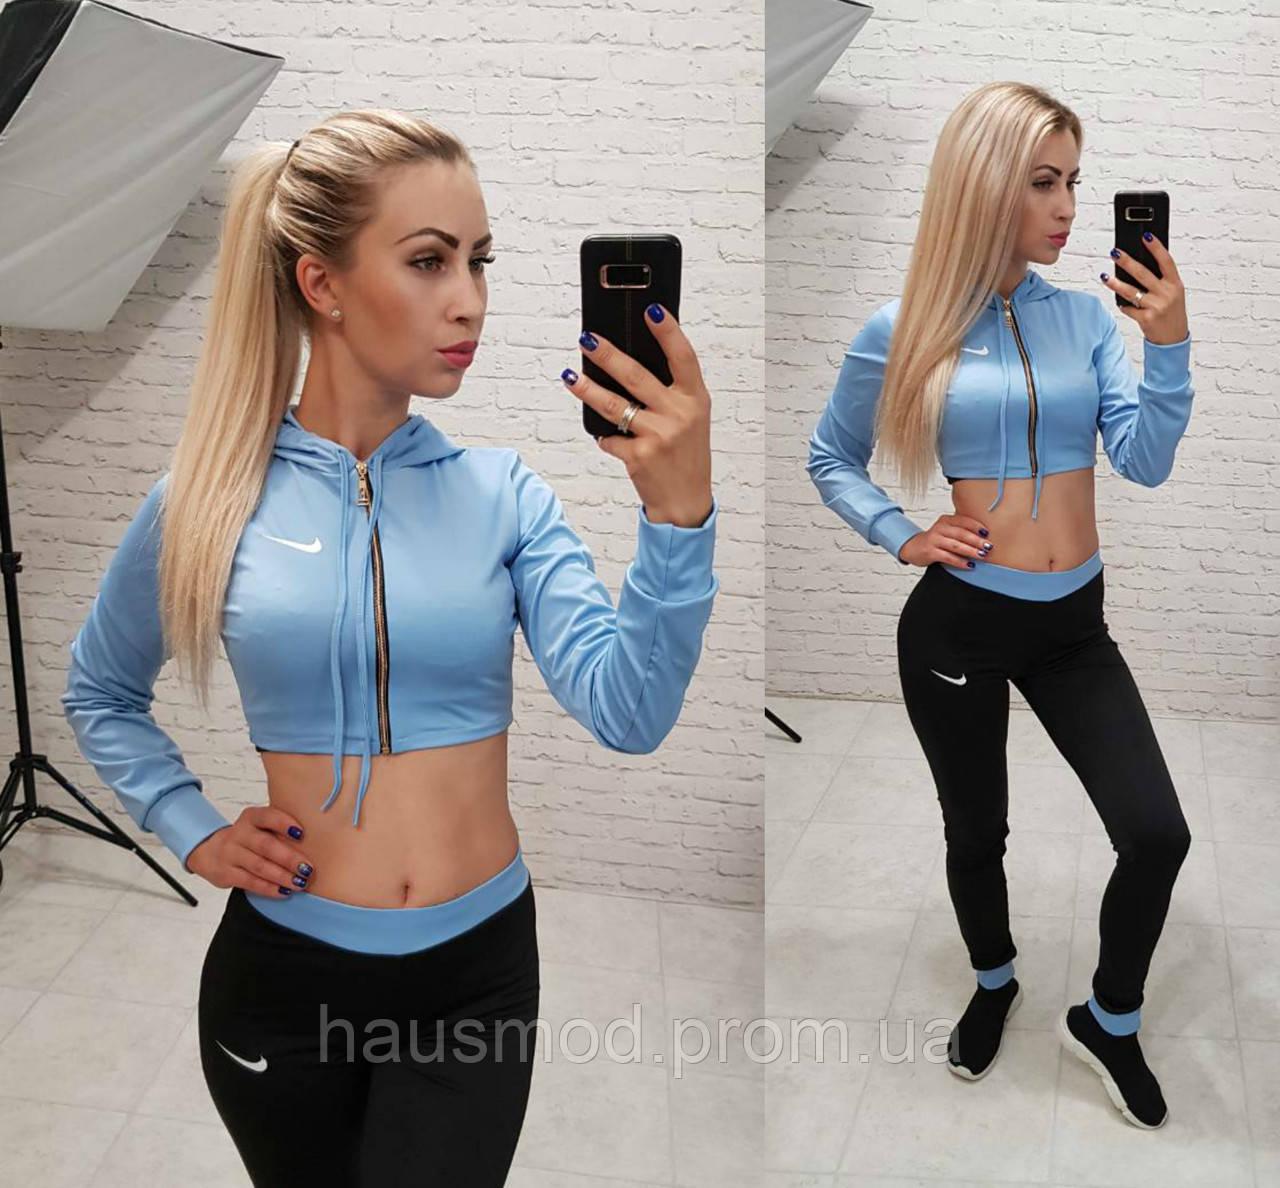 Фитнес костюм 3-ка реплика Nike мастерка мини топ и лосины микро дайвинг голубой